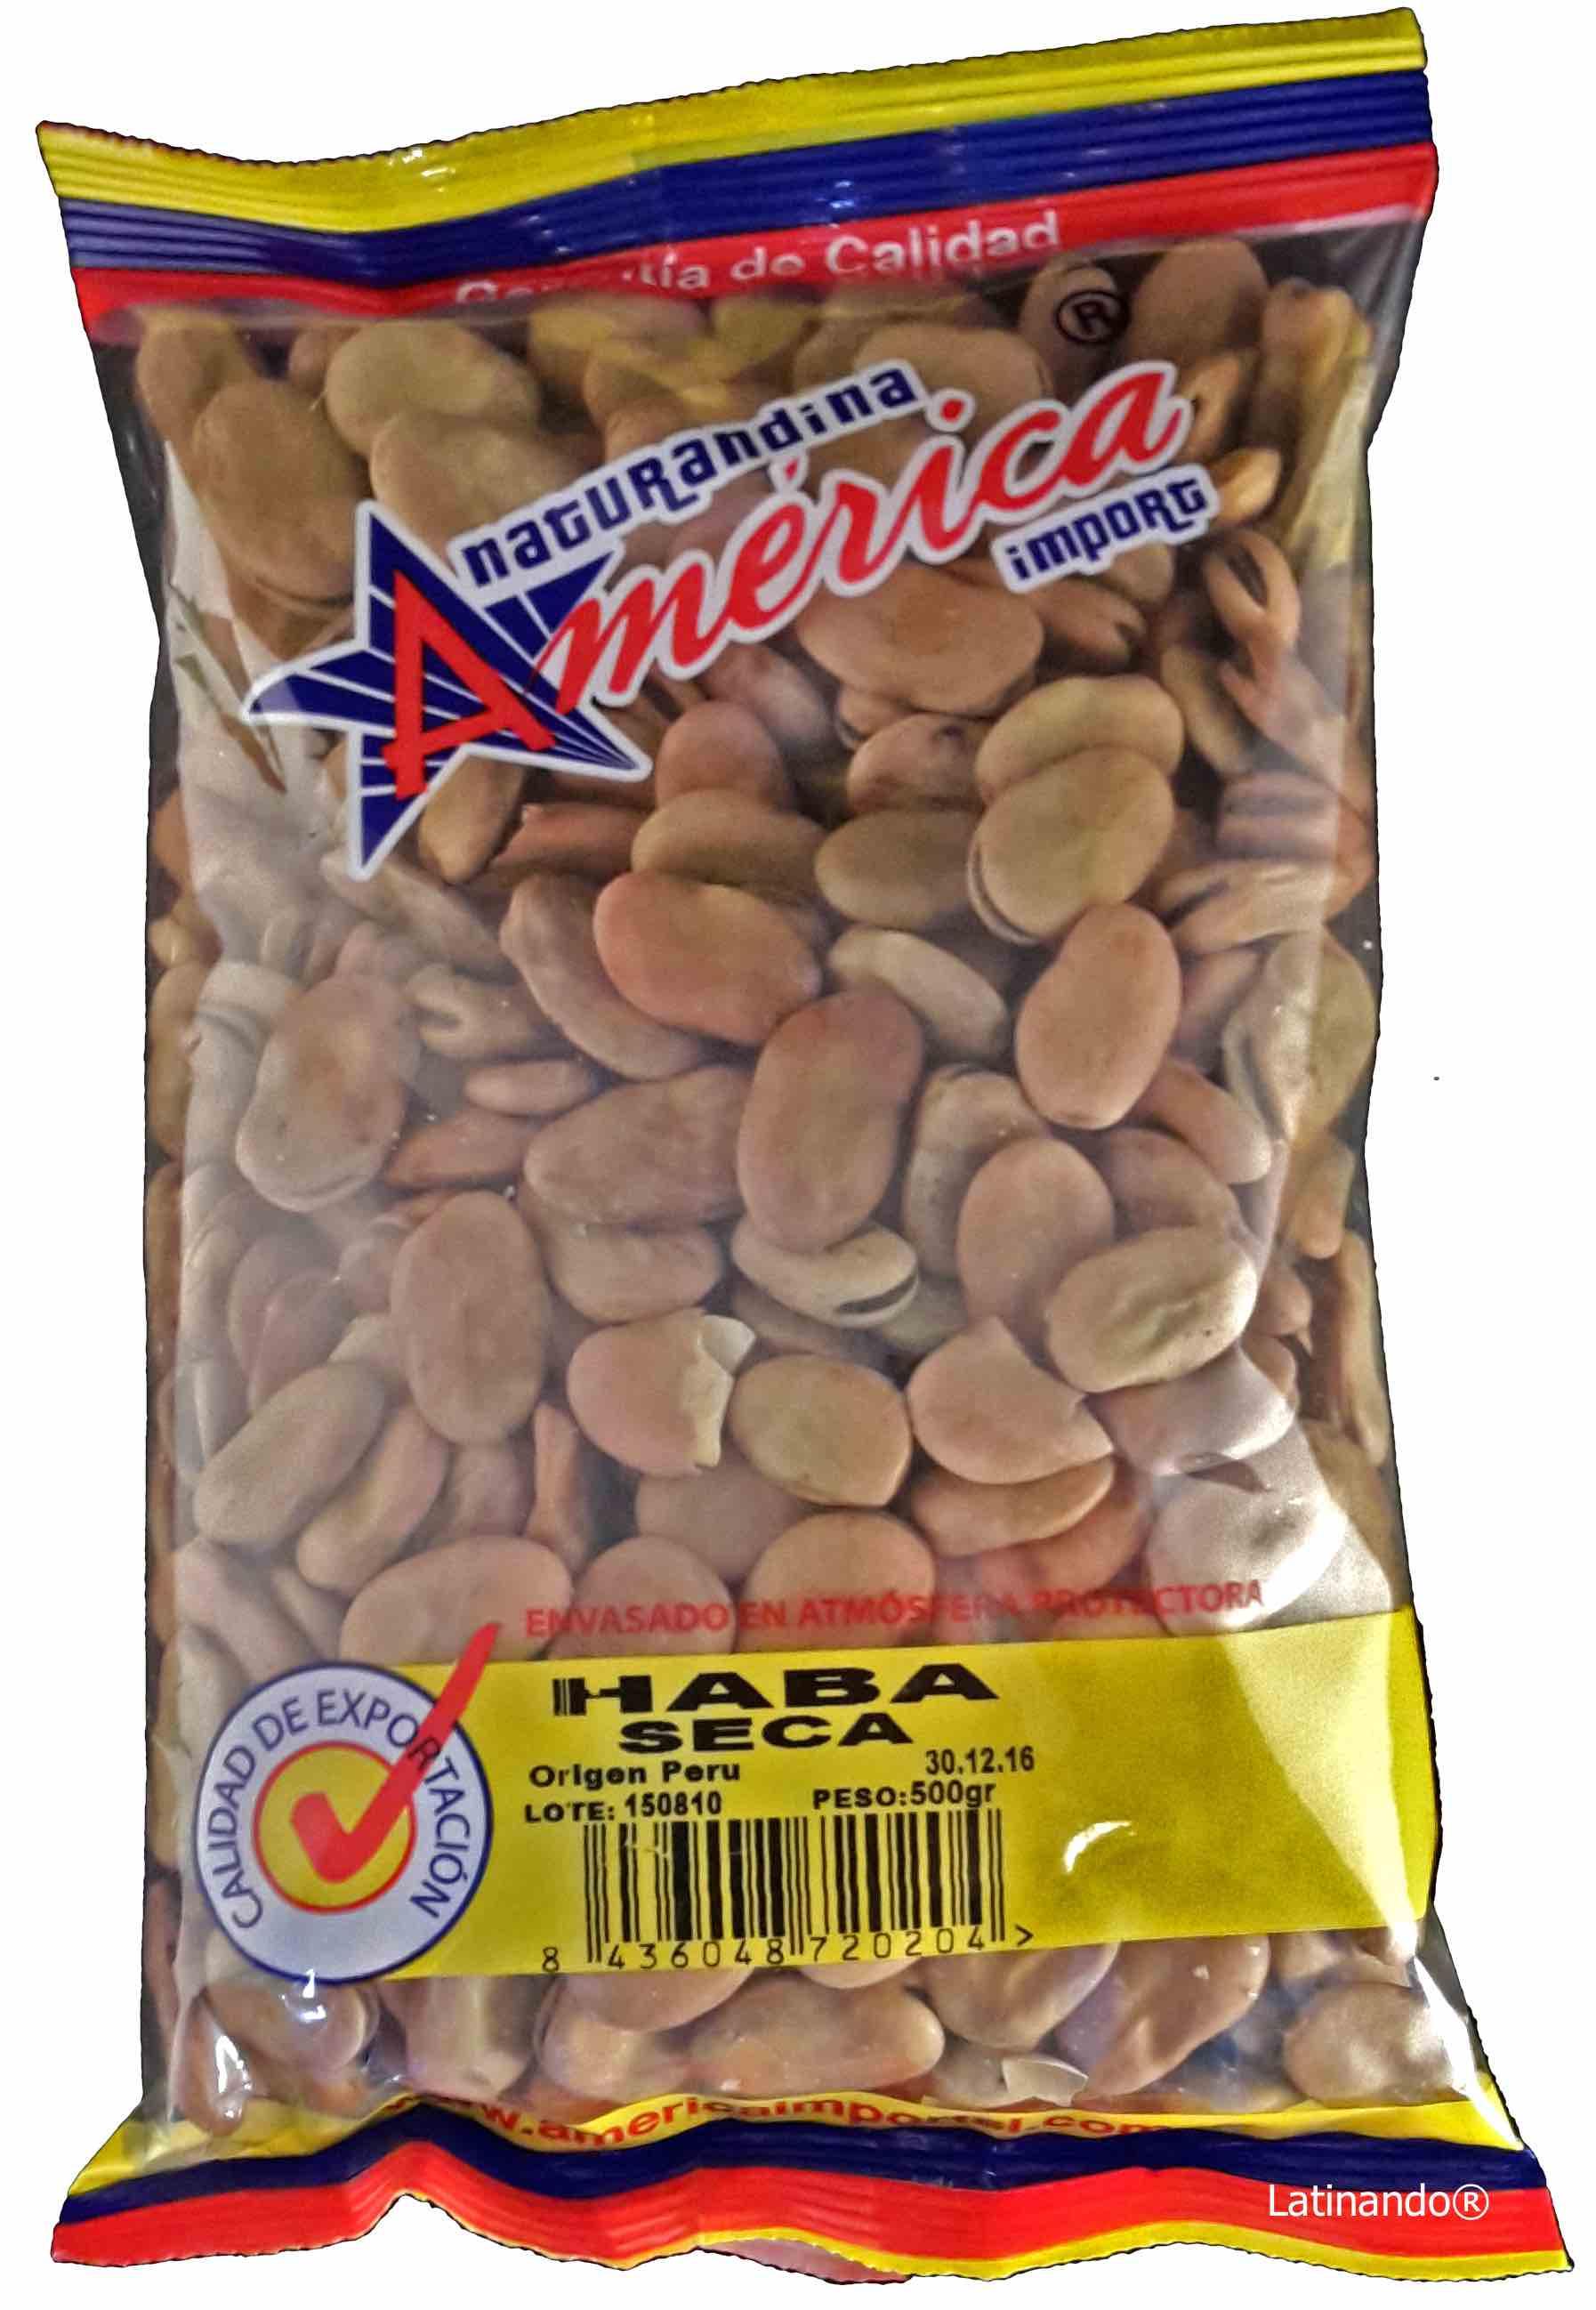 Getrocknete Limabohnen Habas Secas 500g Latinando